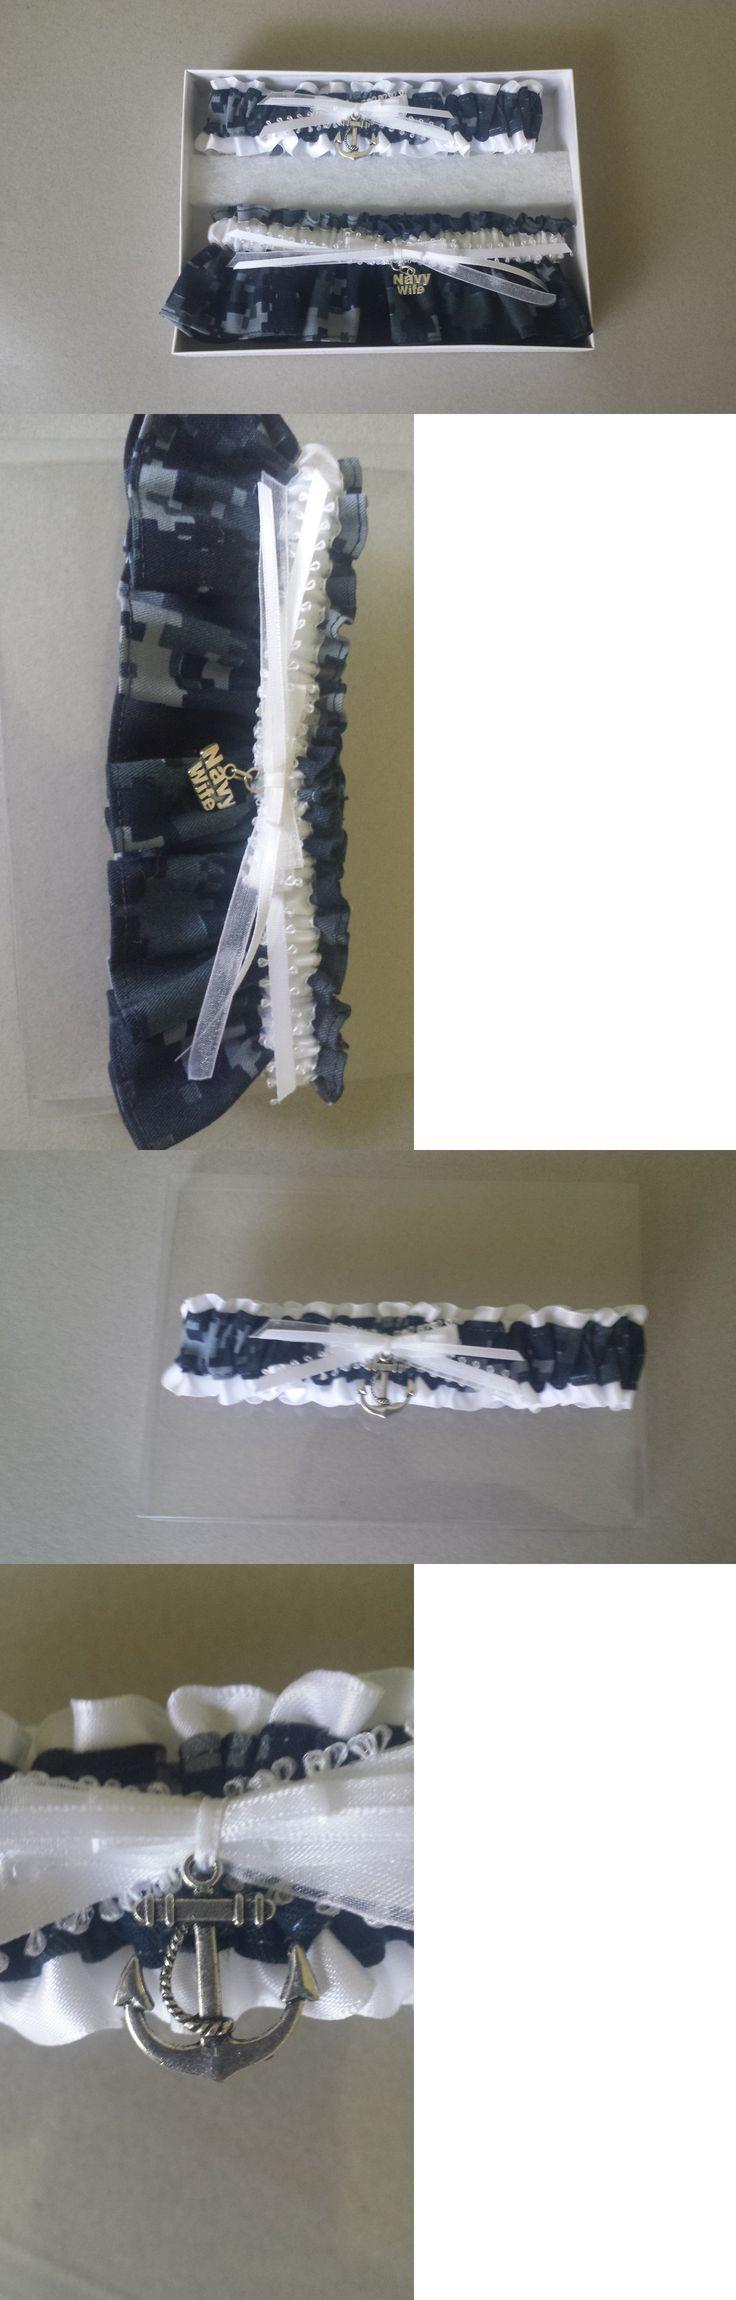 Garters 15718: New Navy Blue White Wedding Garter Prom Us Navy Nautical Garter Marine Military -> BUY IT NOW ONLY: $30 on eBay!